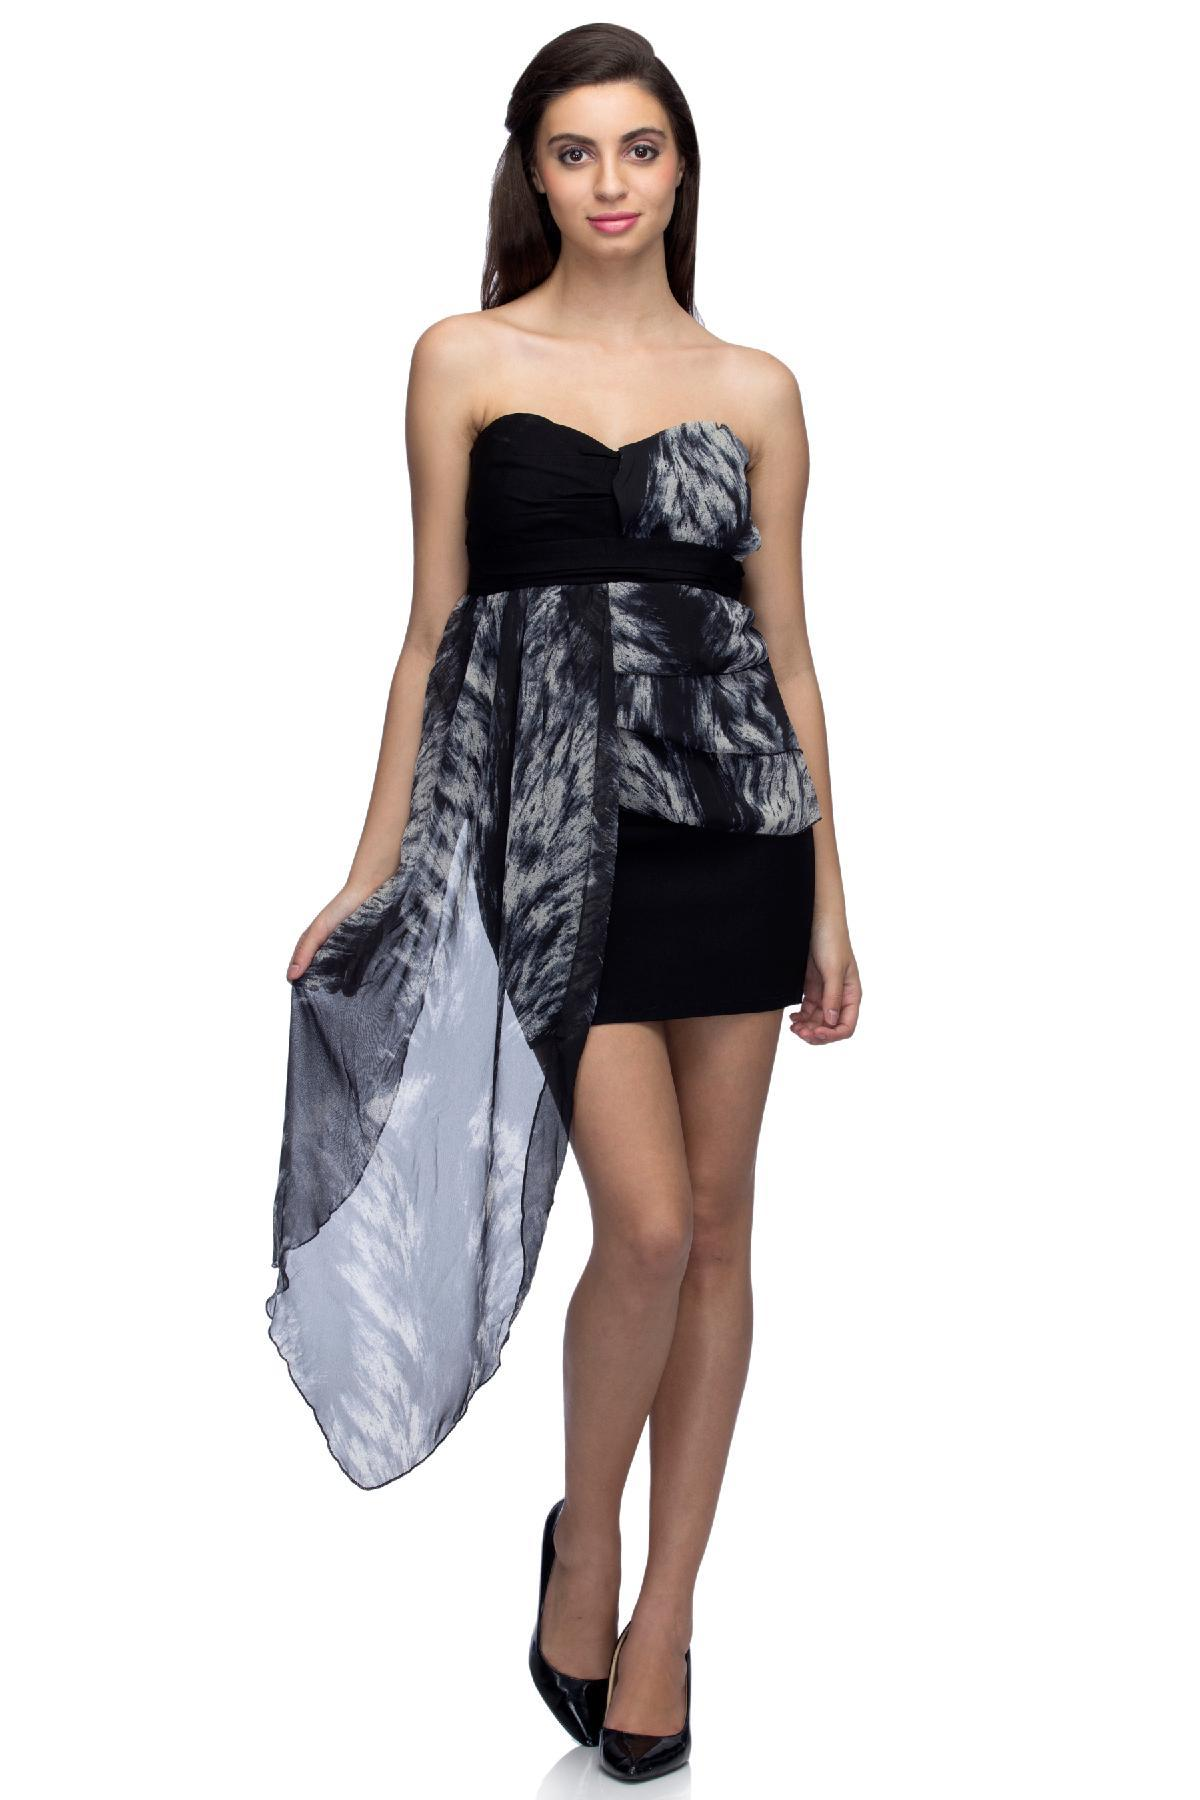 c8bb55a1b62 RIB clothing The Freedom Dress Black   White dress for rent ...